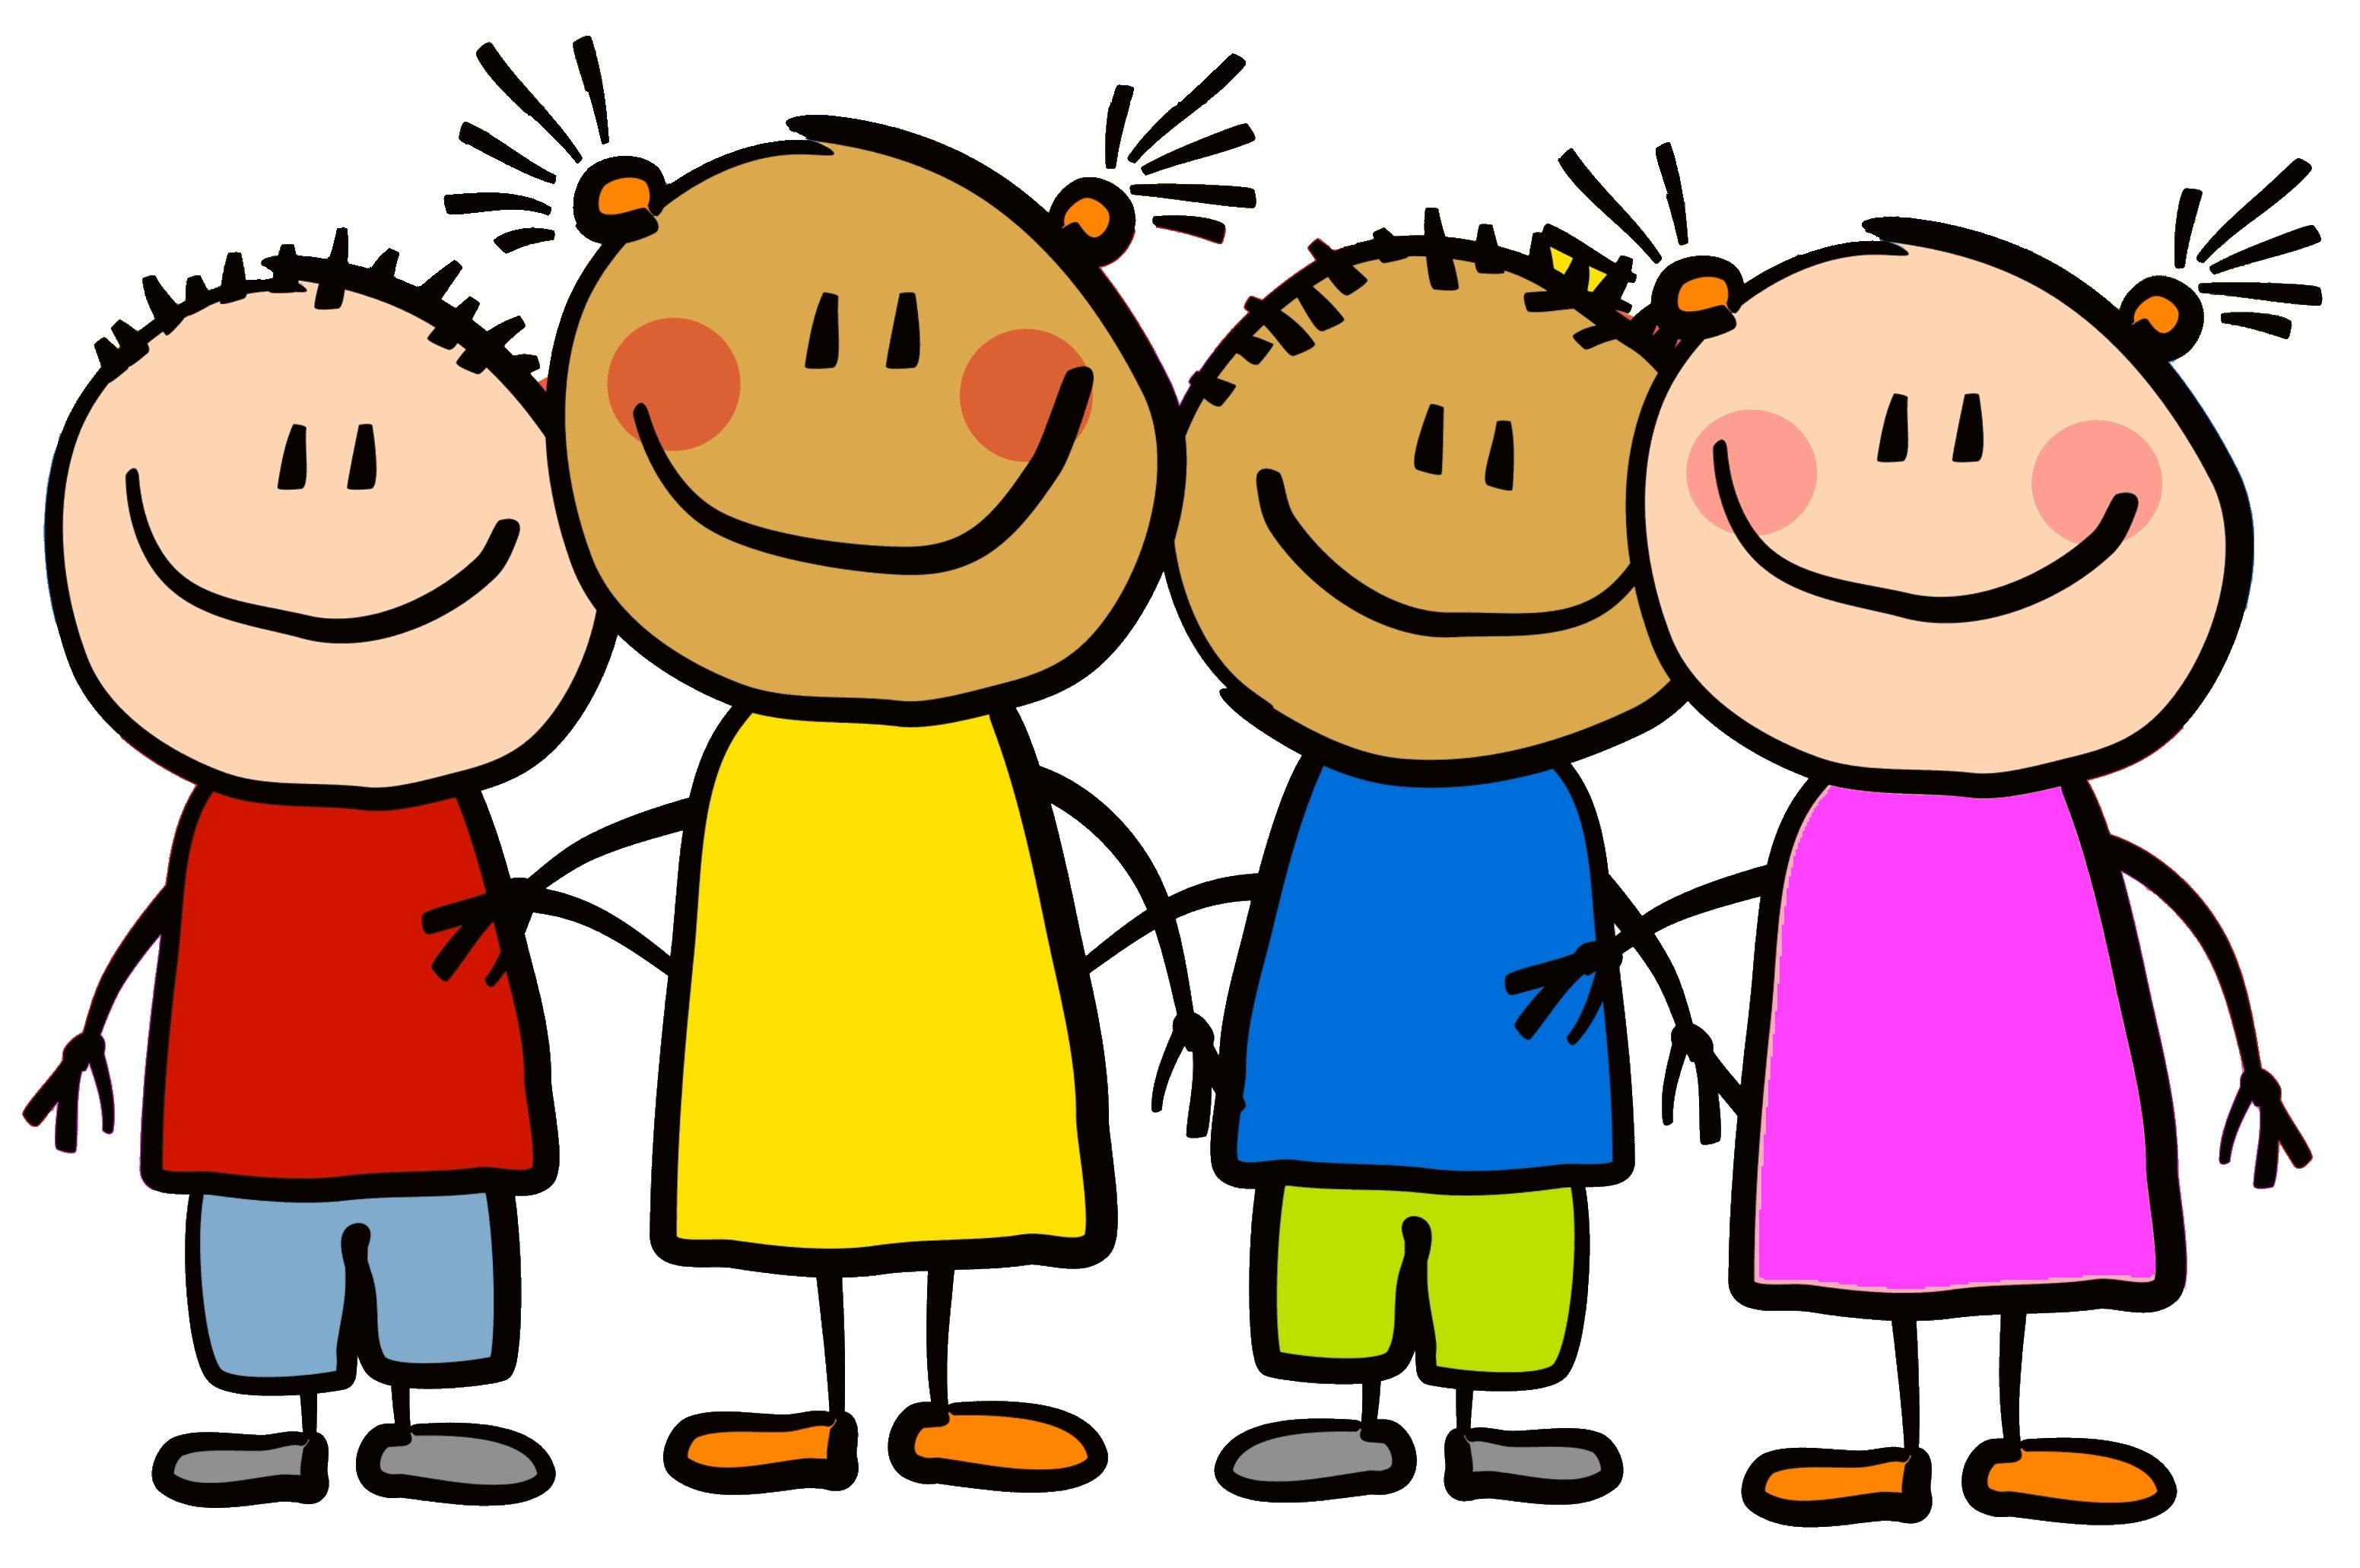 Preschool Children Clipart ... Cliparts -preschool children clipart ... Cliparts All Used For Free-18